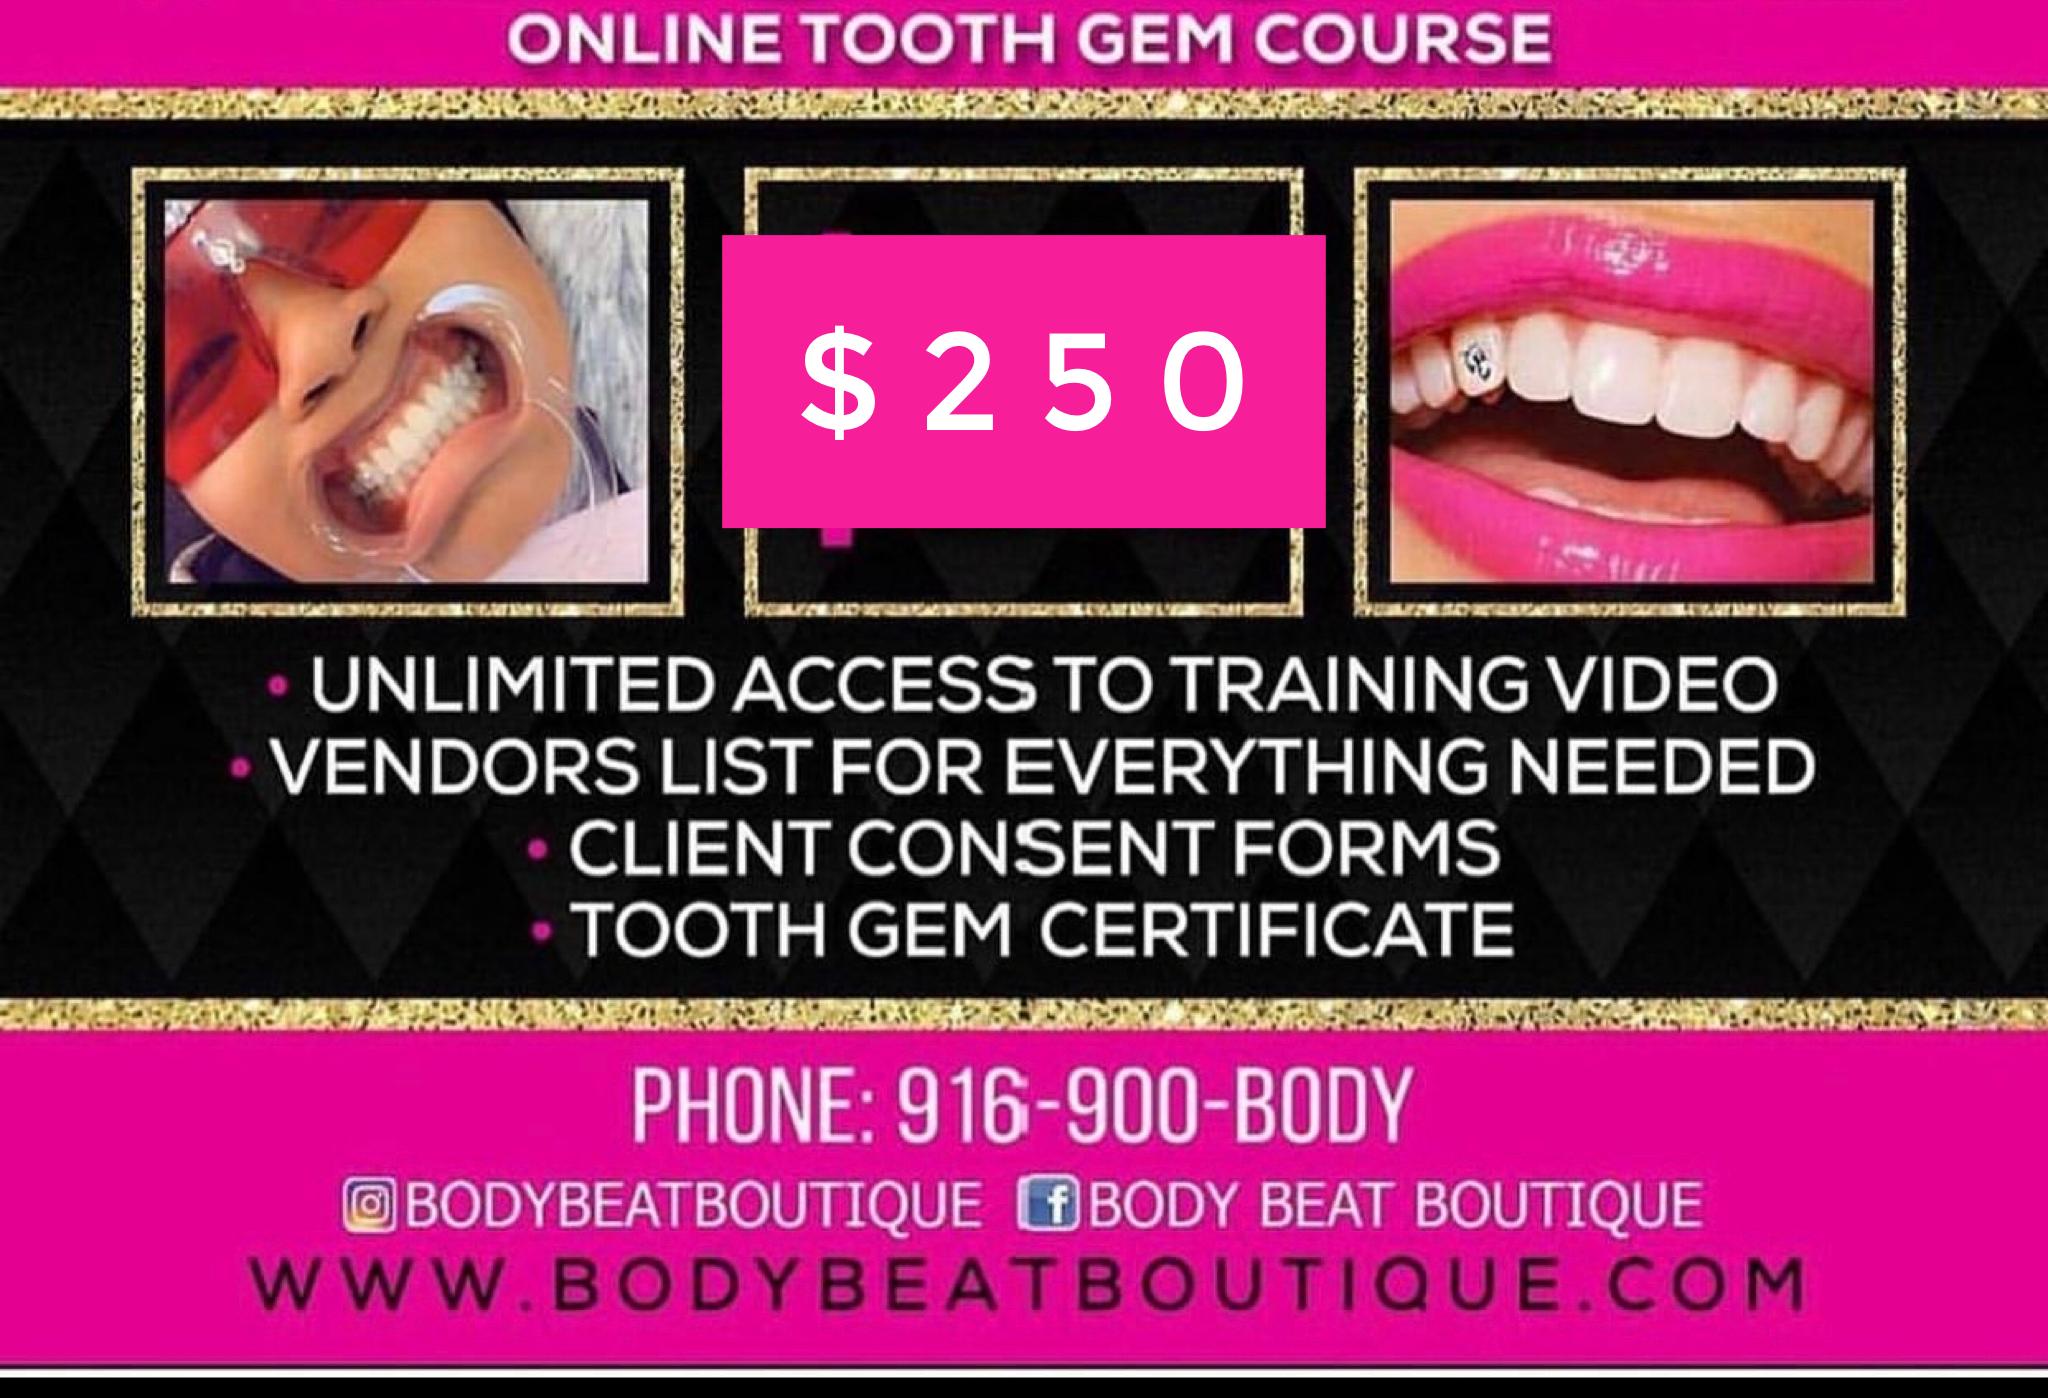 Tooth Gem Training Sale